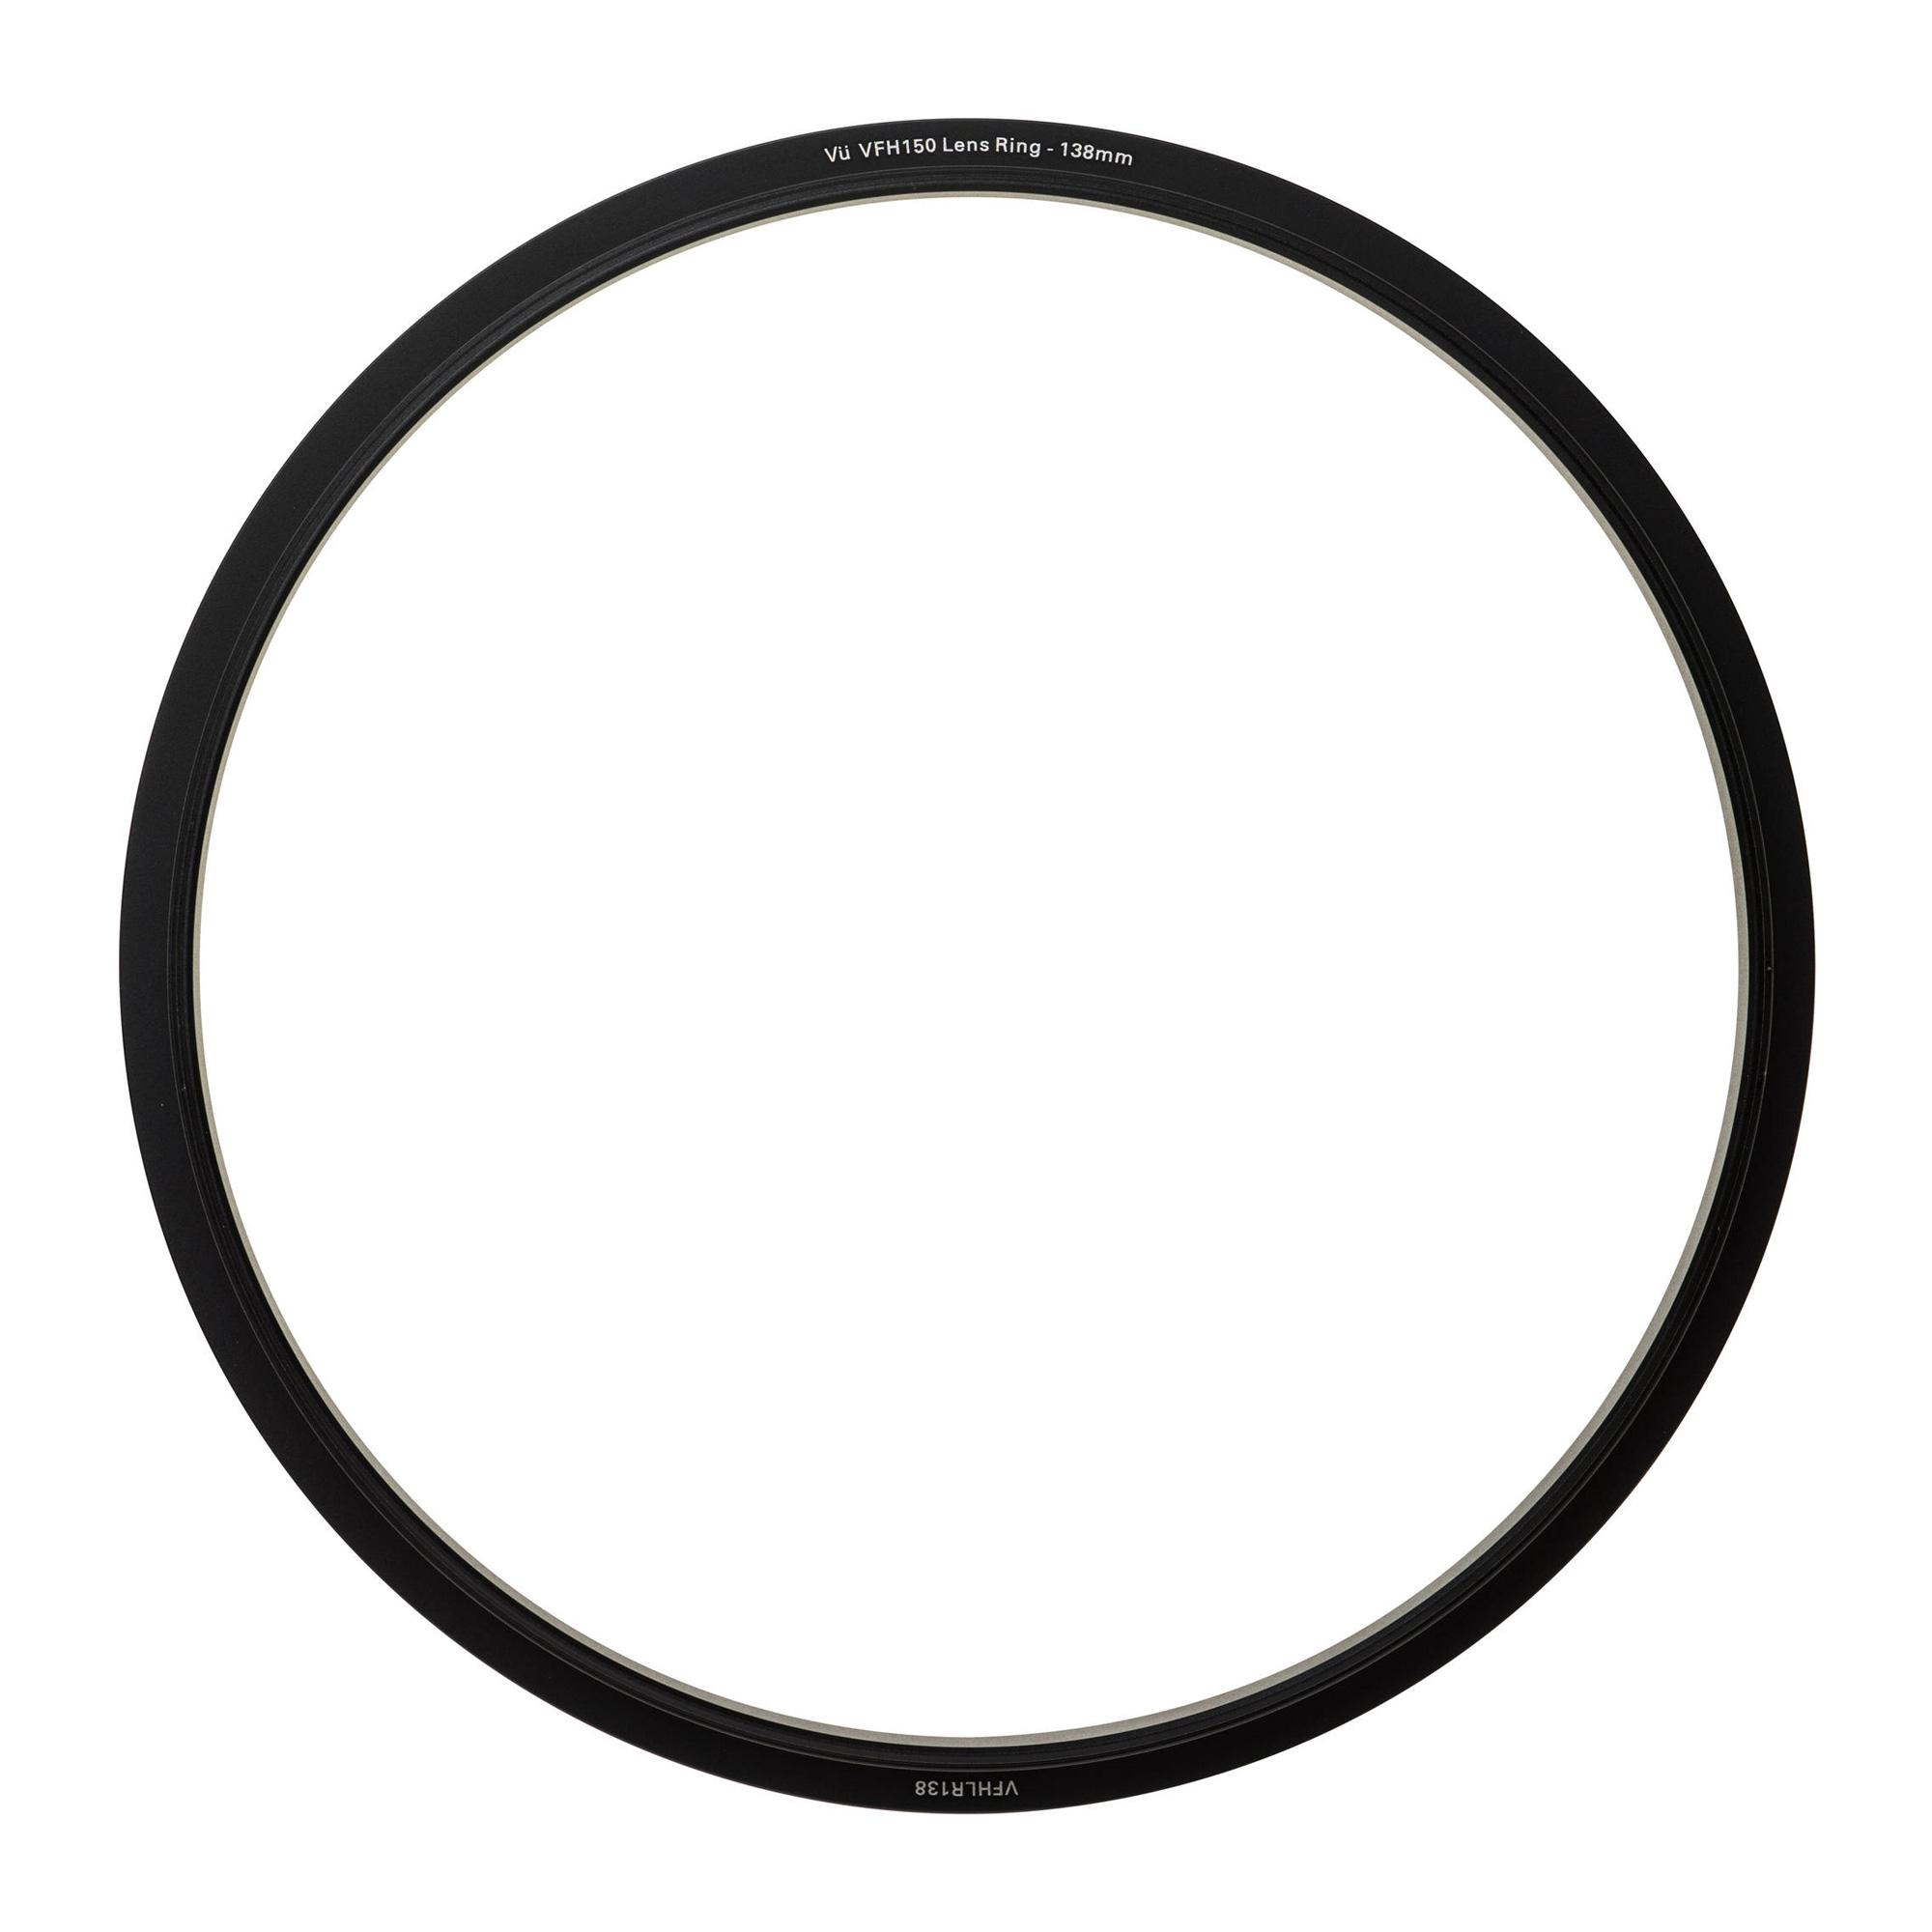 150mm Professional Filter Holder 138mm Lens Ring